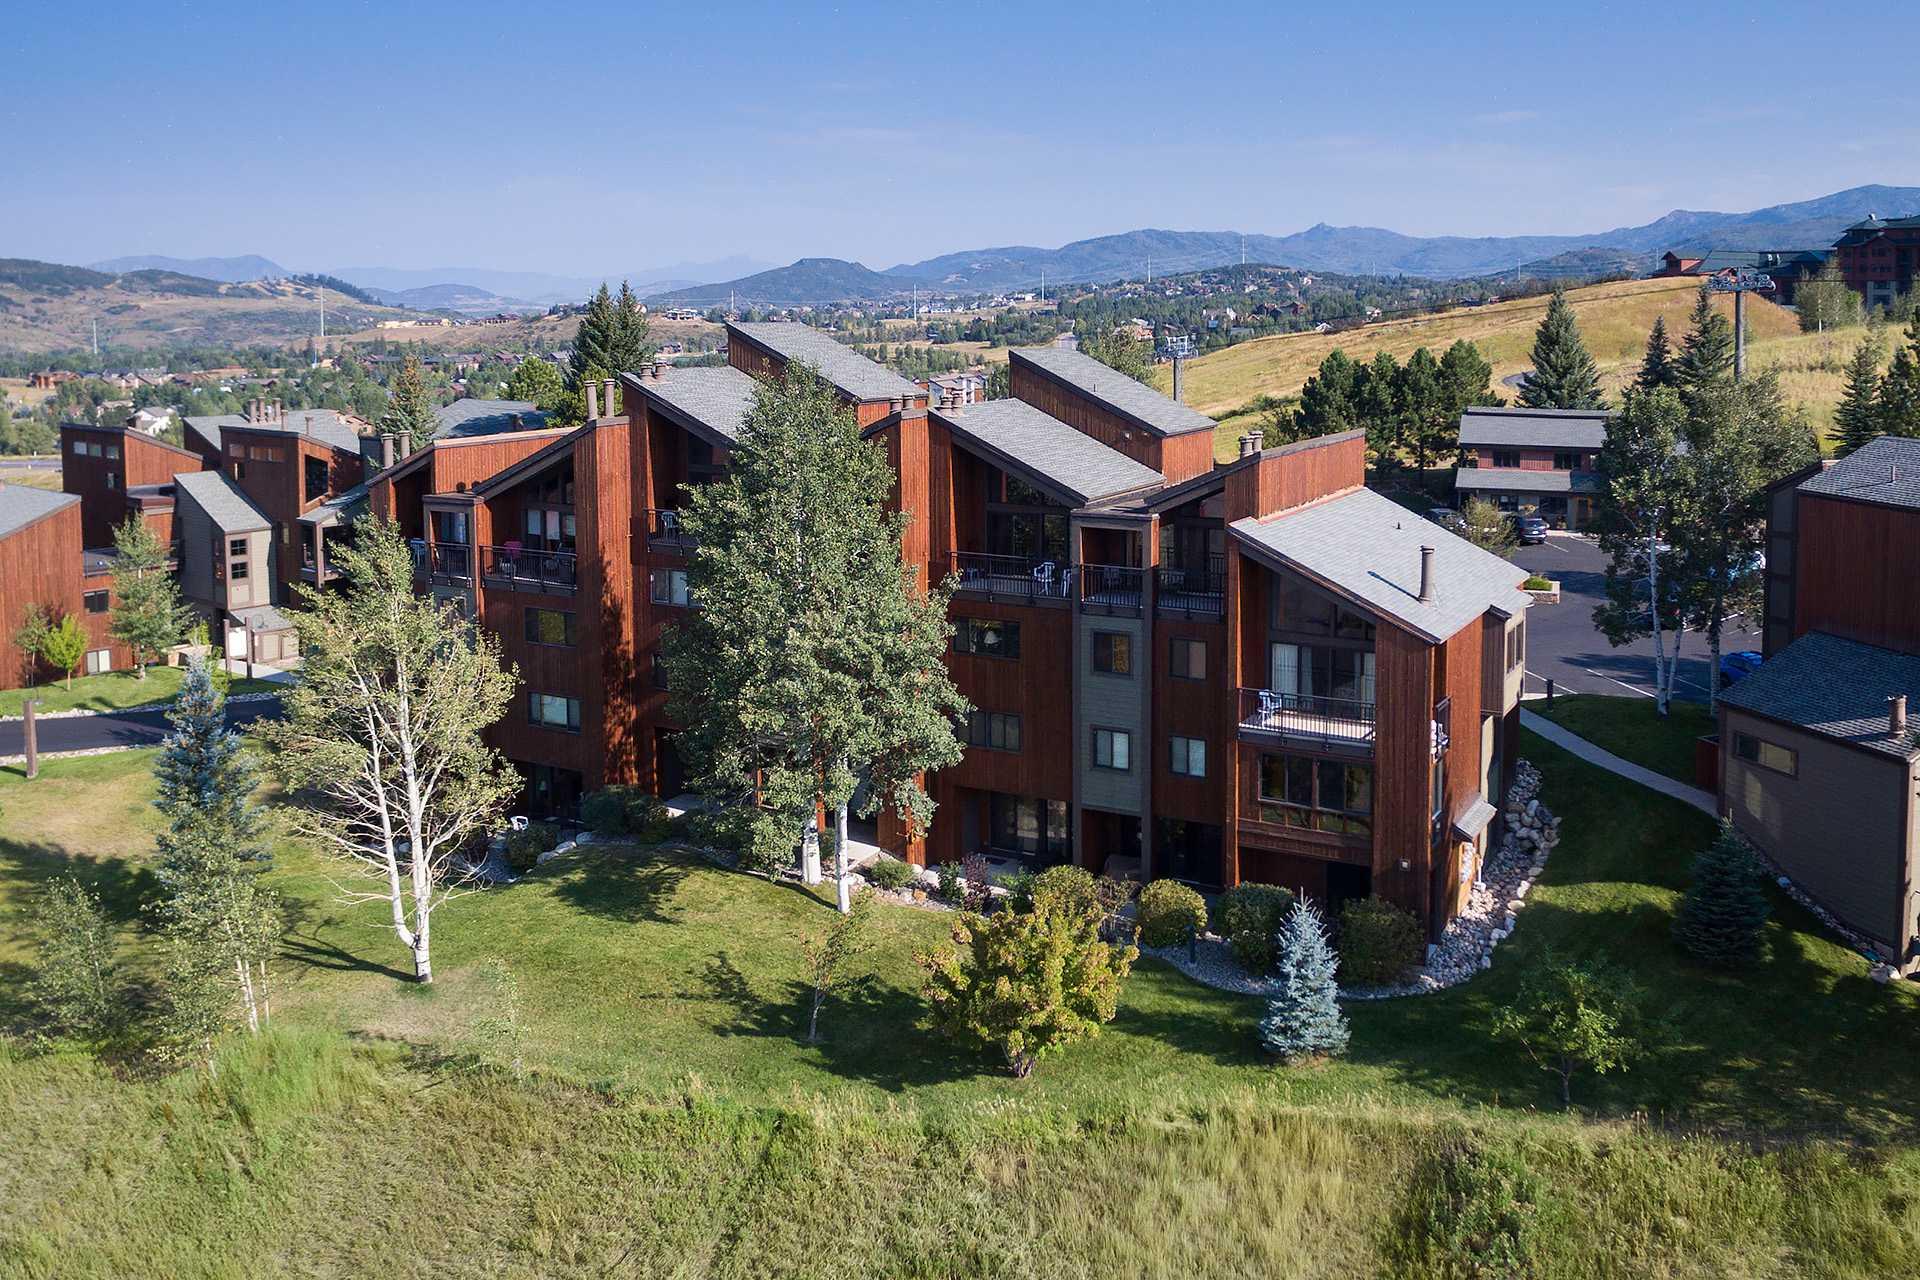 W3536: The West Condominiums